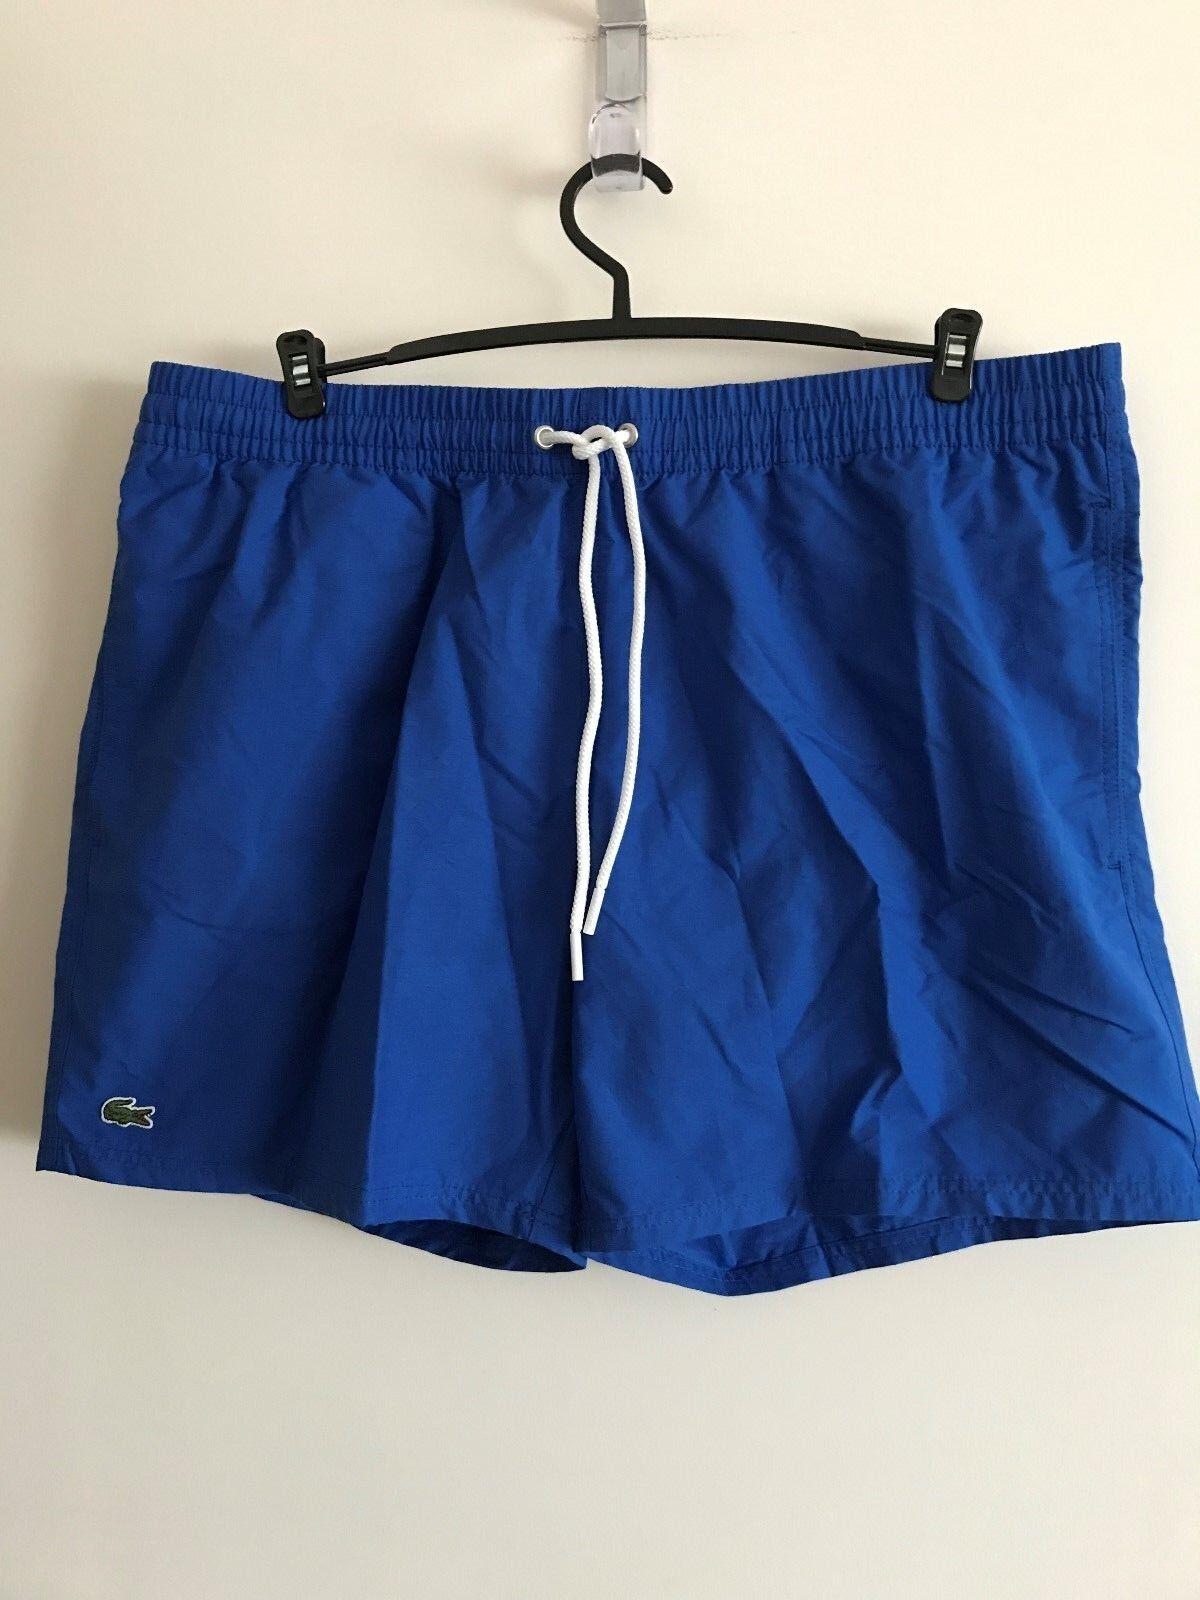 NWT LACOSTE CROC LOGO MENS SWIM TRUNKS SHORTS blueE Sz L, XL